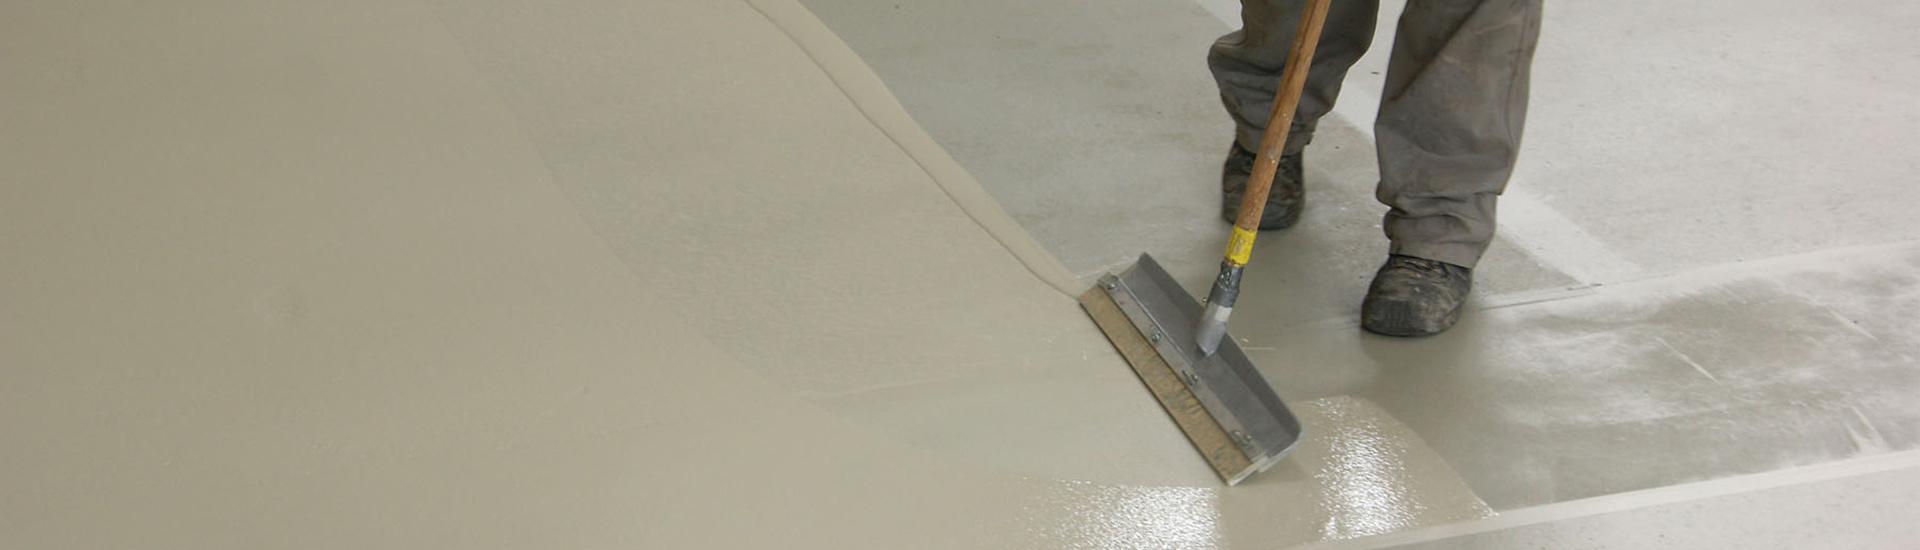 pavimentos-industriais-slide-epicentro